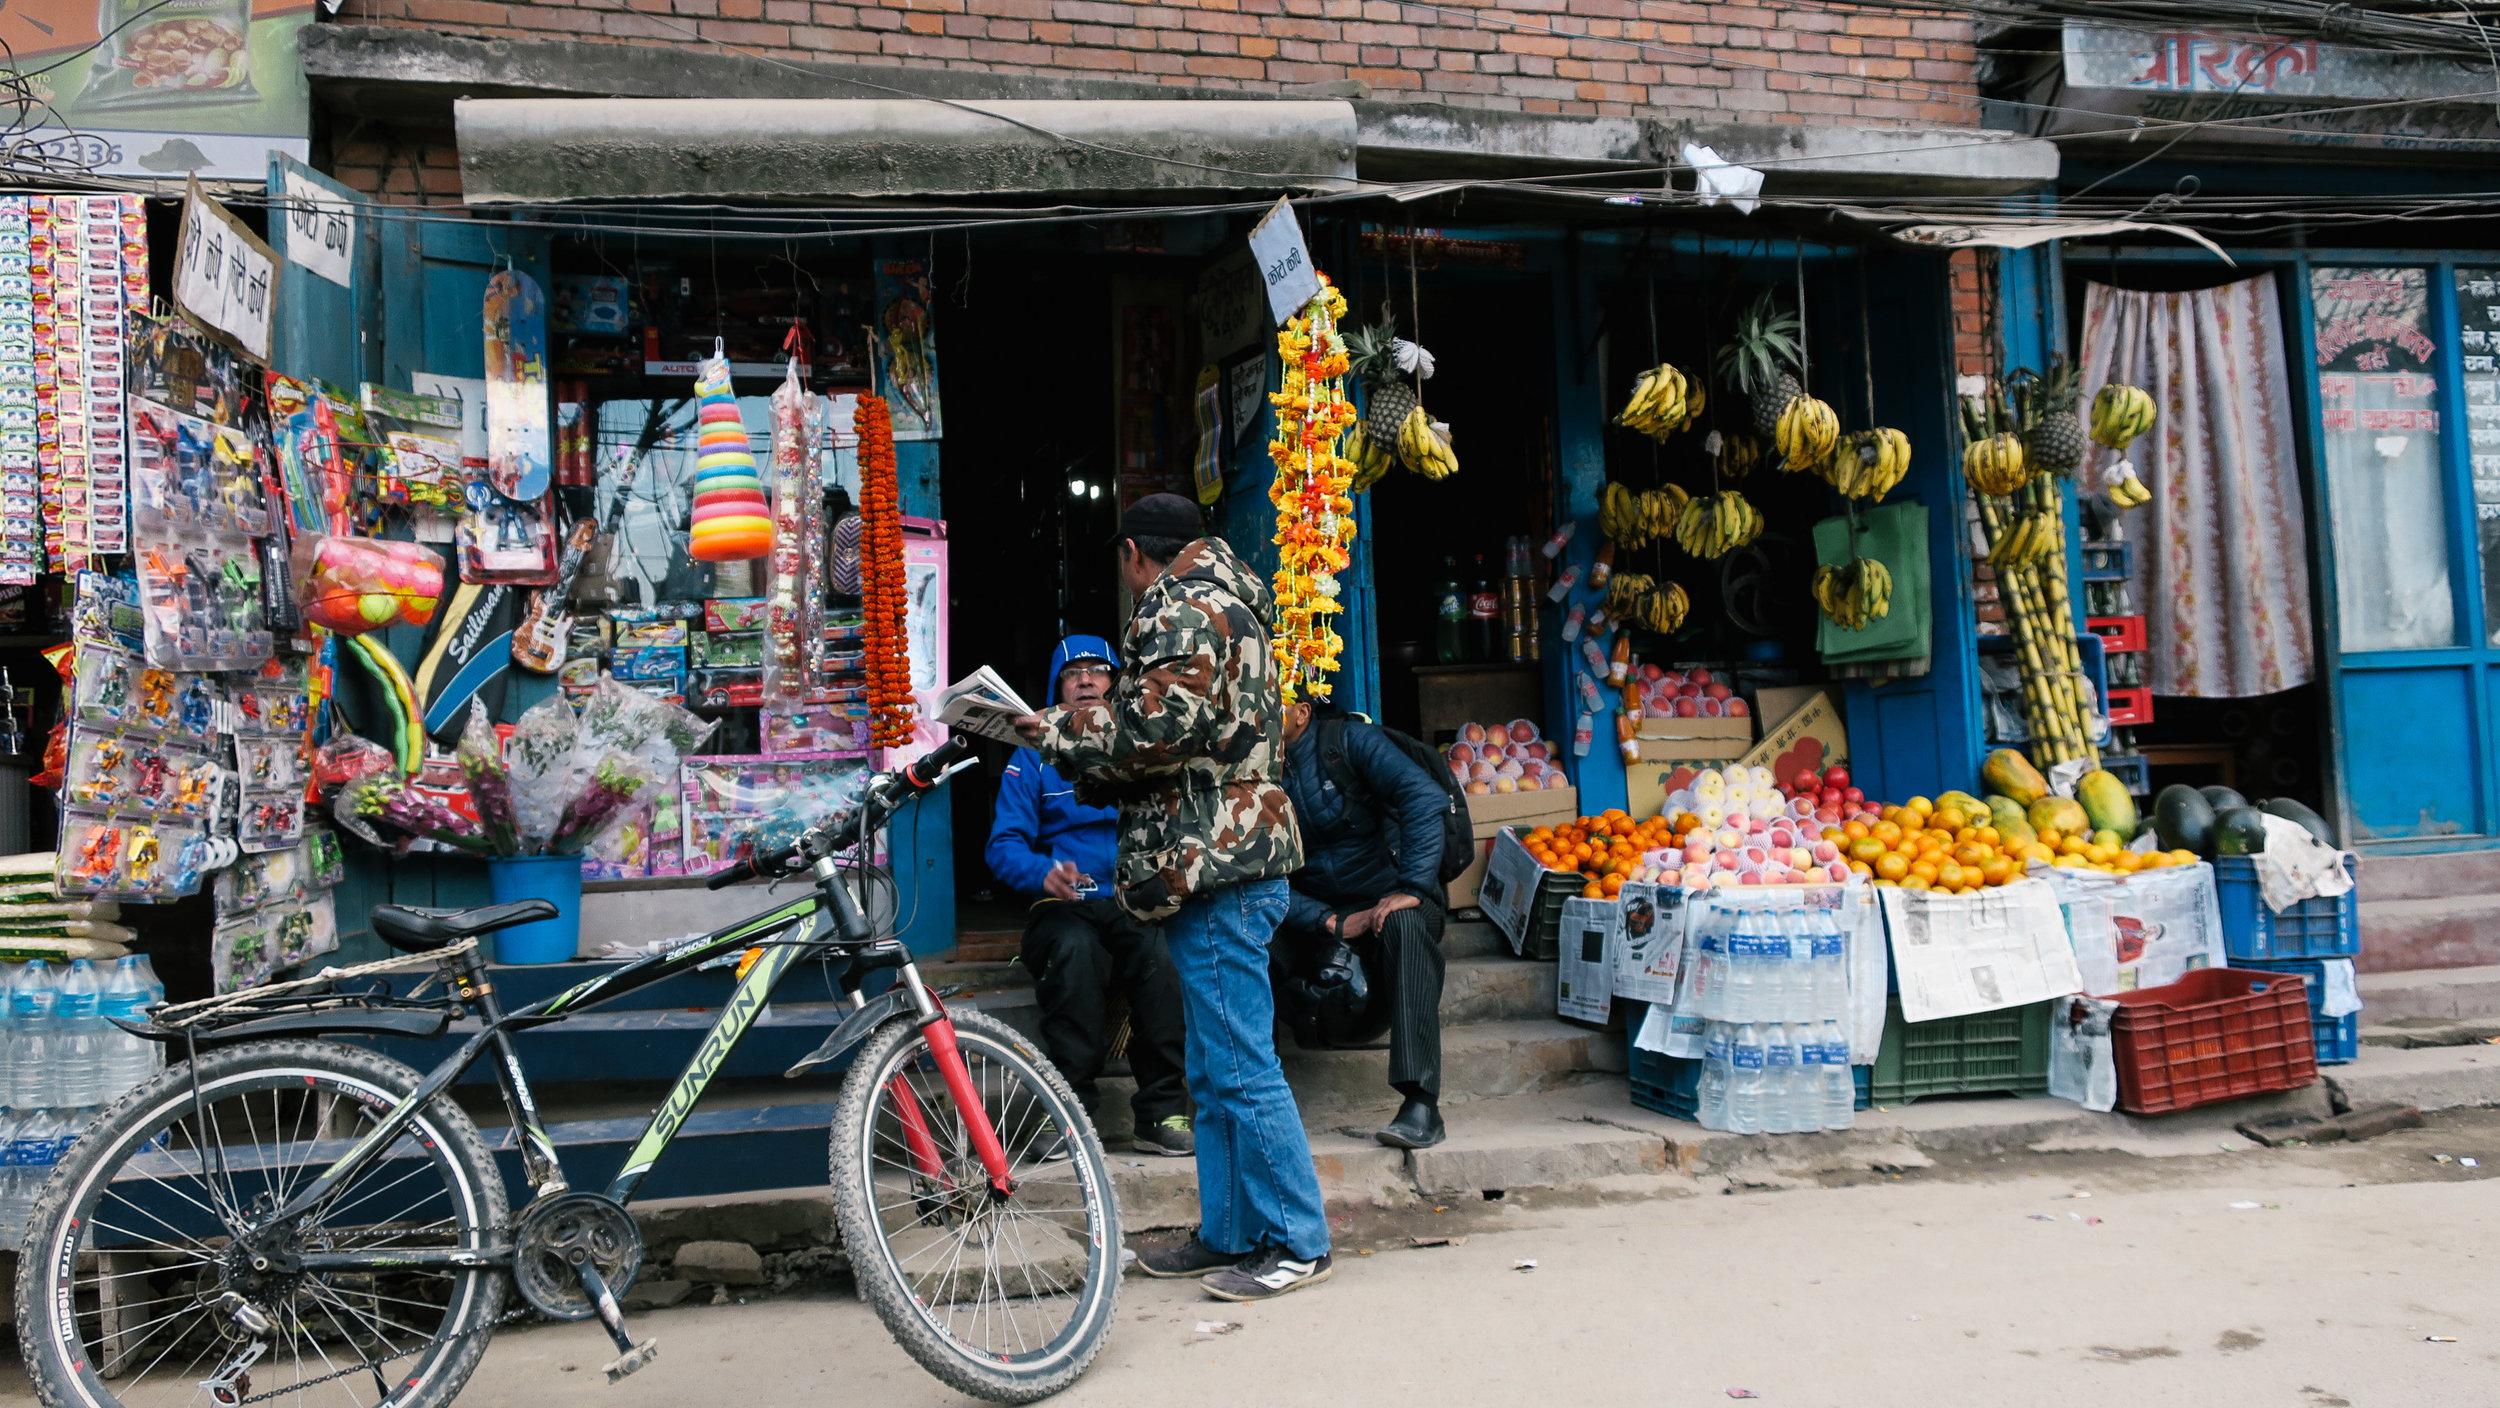 10-things-to-know-kathmandu-nepal-lifeonpine_IMG_0379.jpg